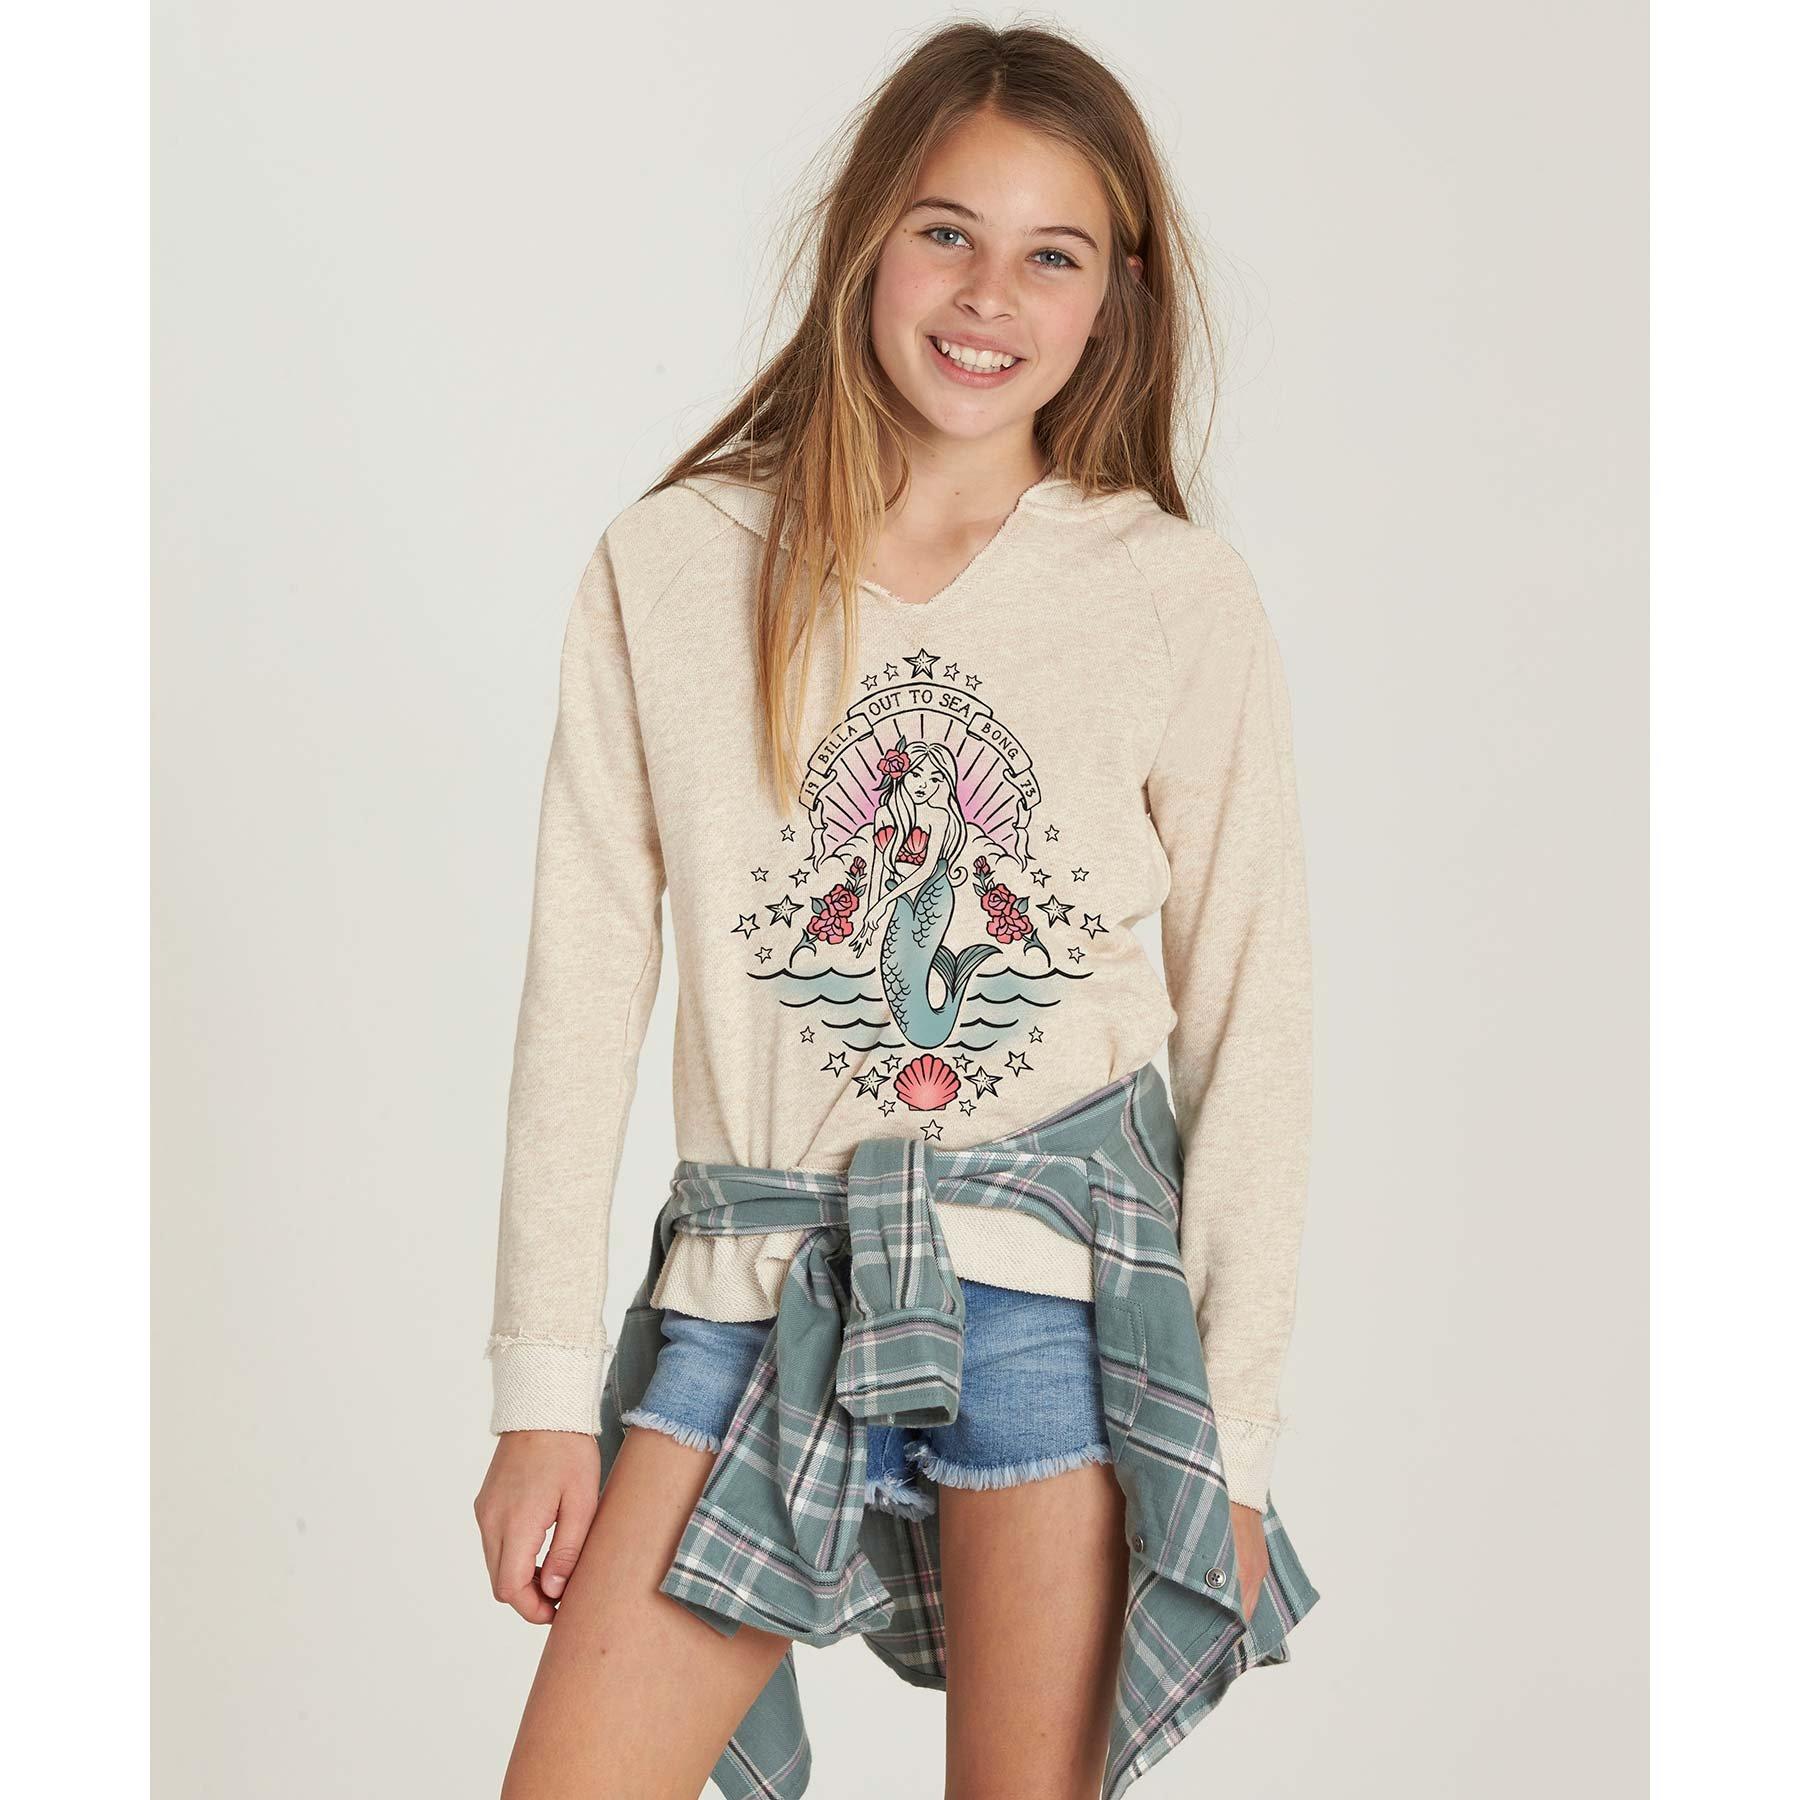 Billabong Big Girls' Surf Tribe Sweatshirt, Oatmeal Heather, XS